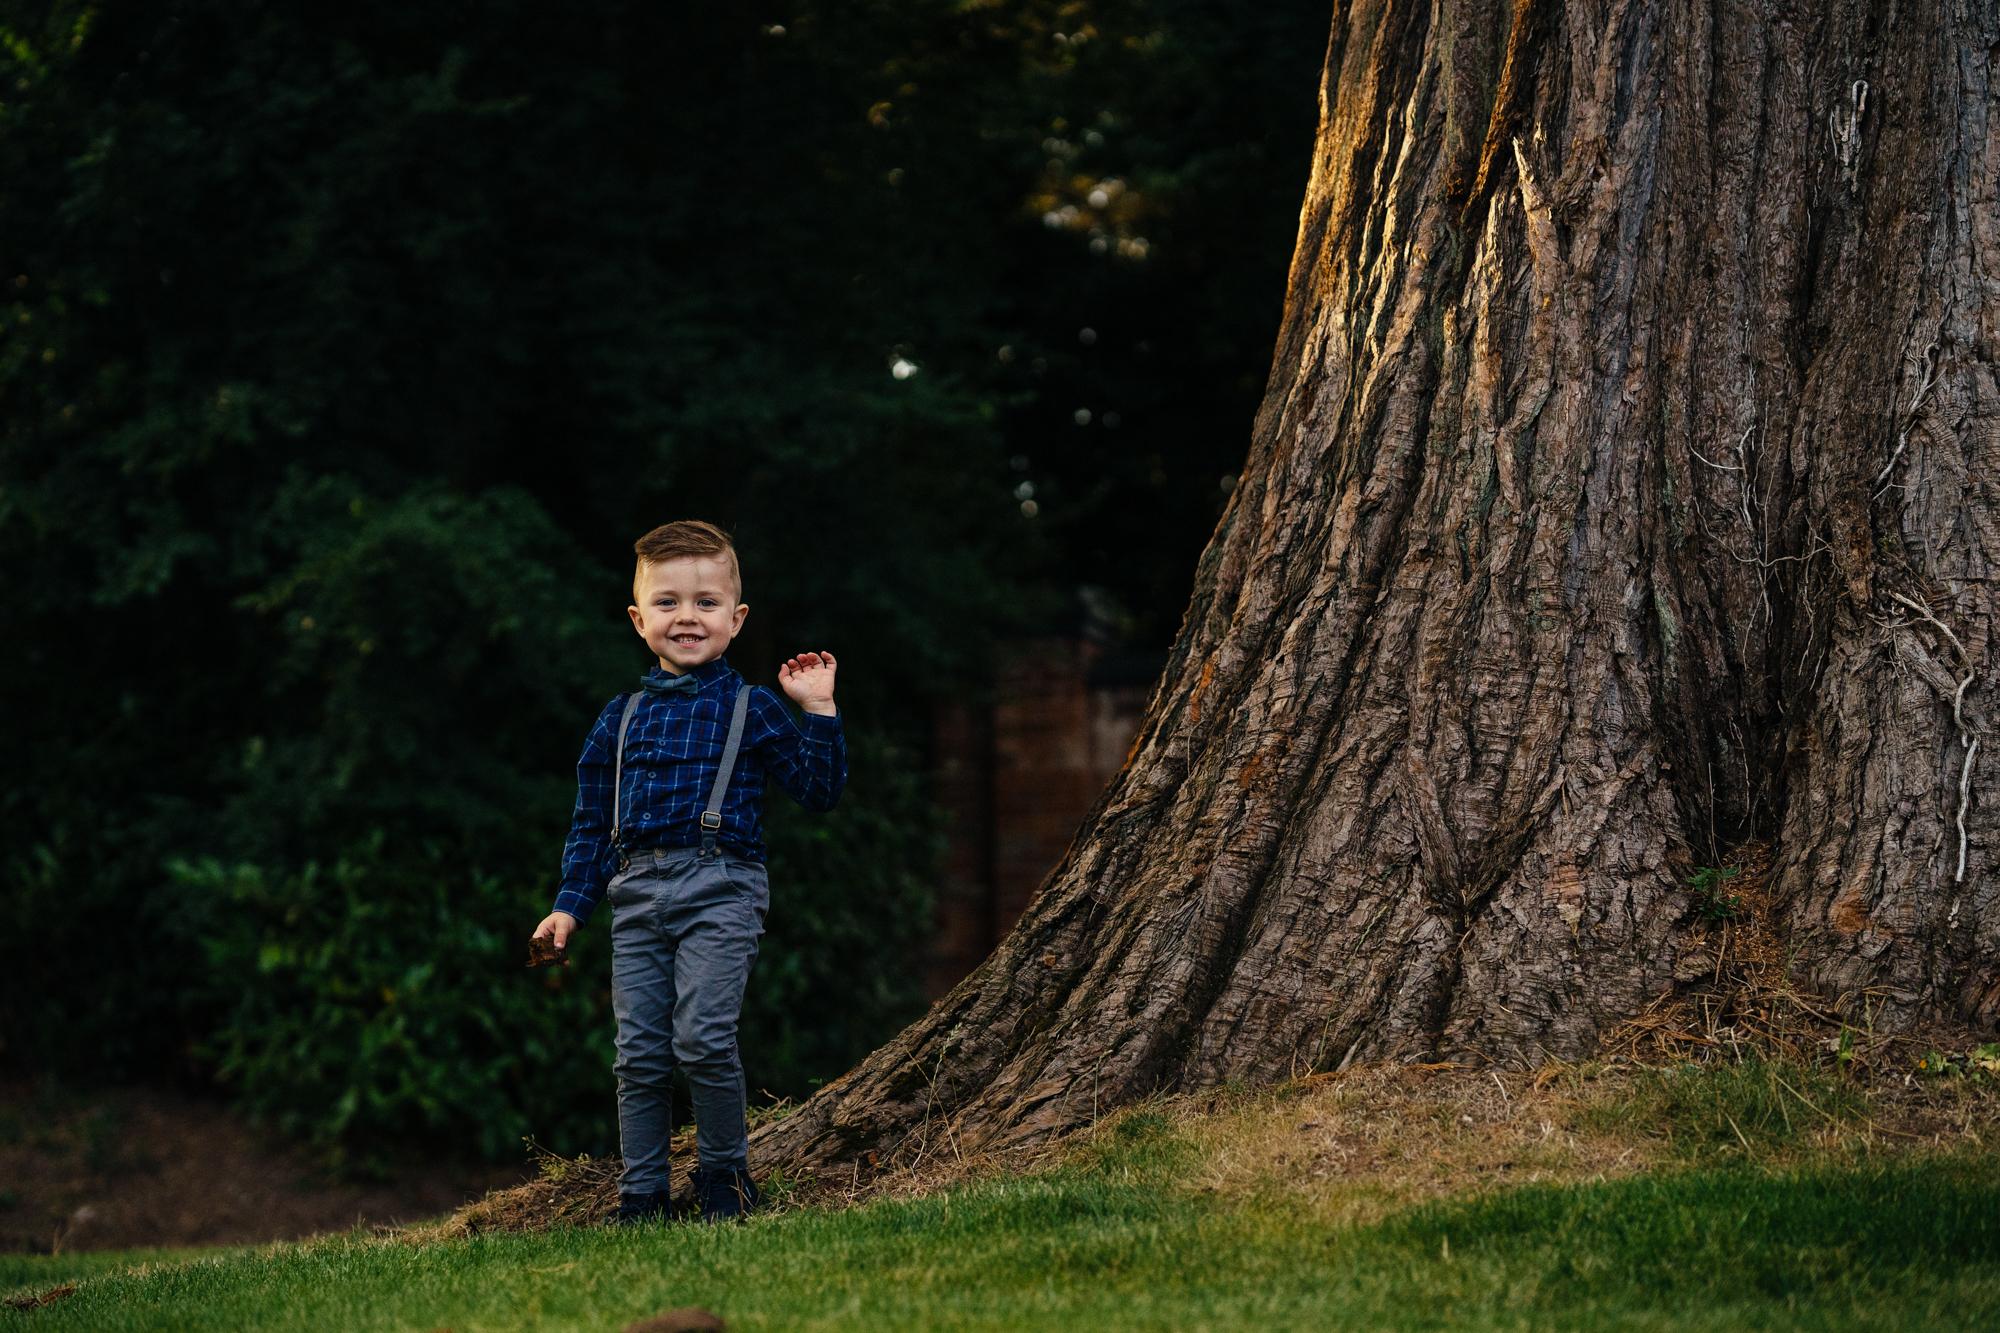 A boy poses